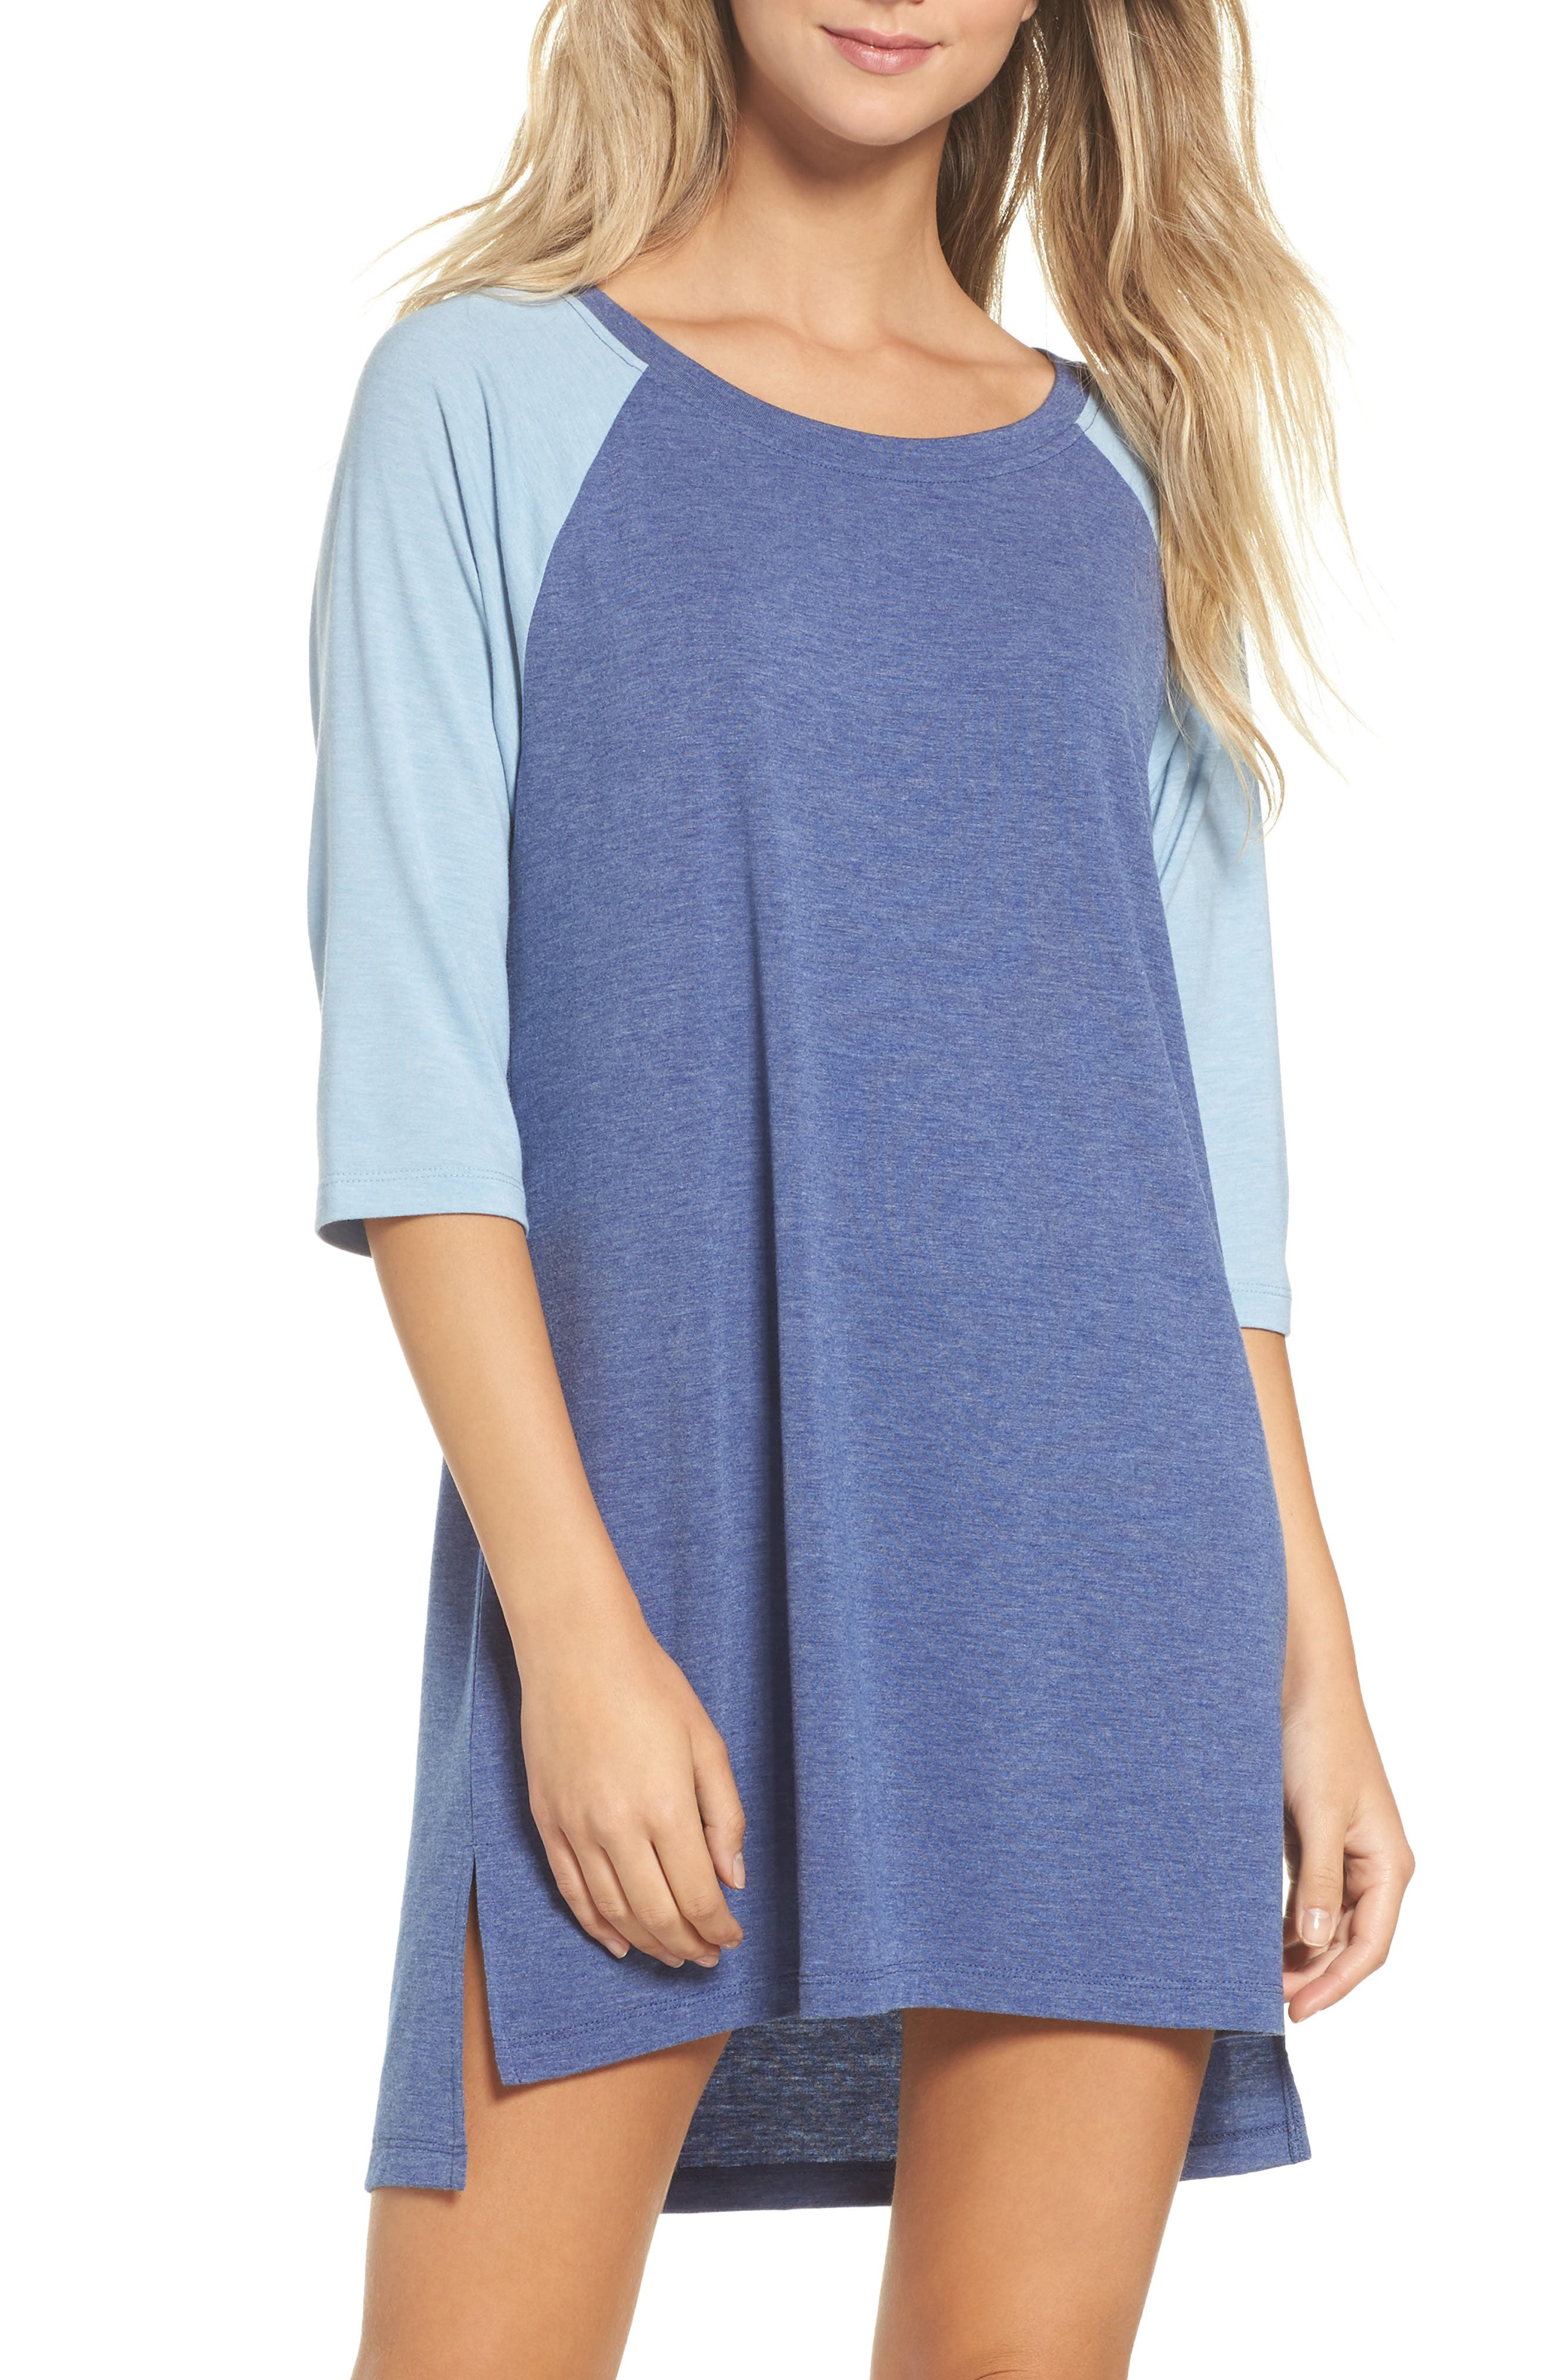 Honeydew All American Sleep Shirt,                         Main,                         color, Dream